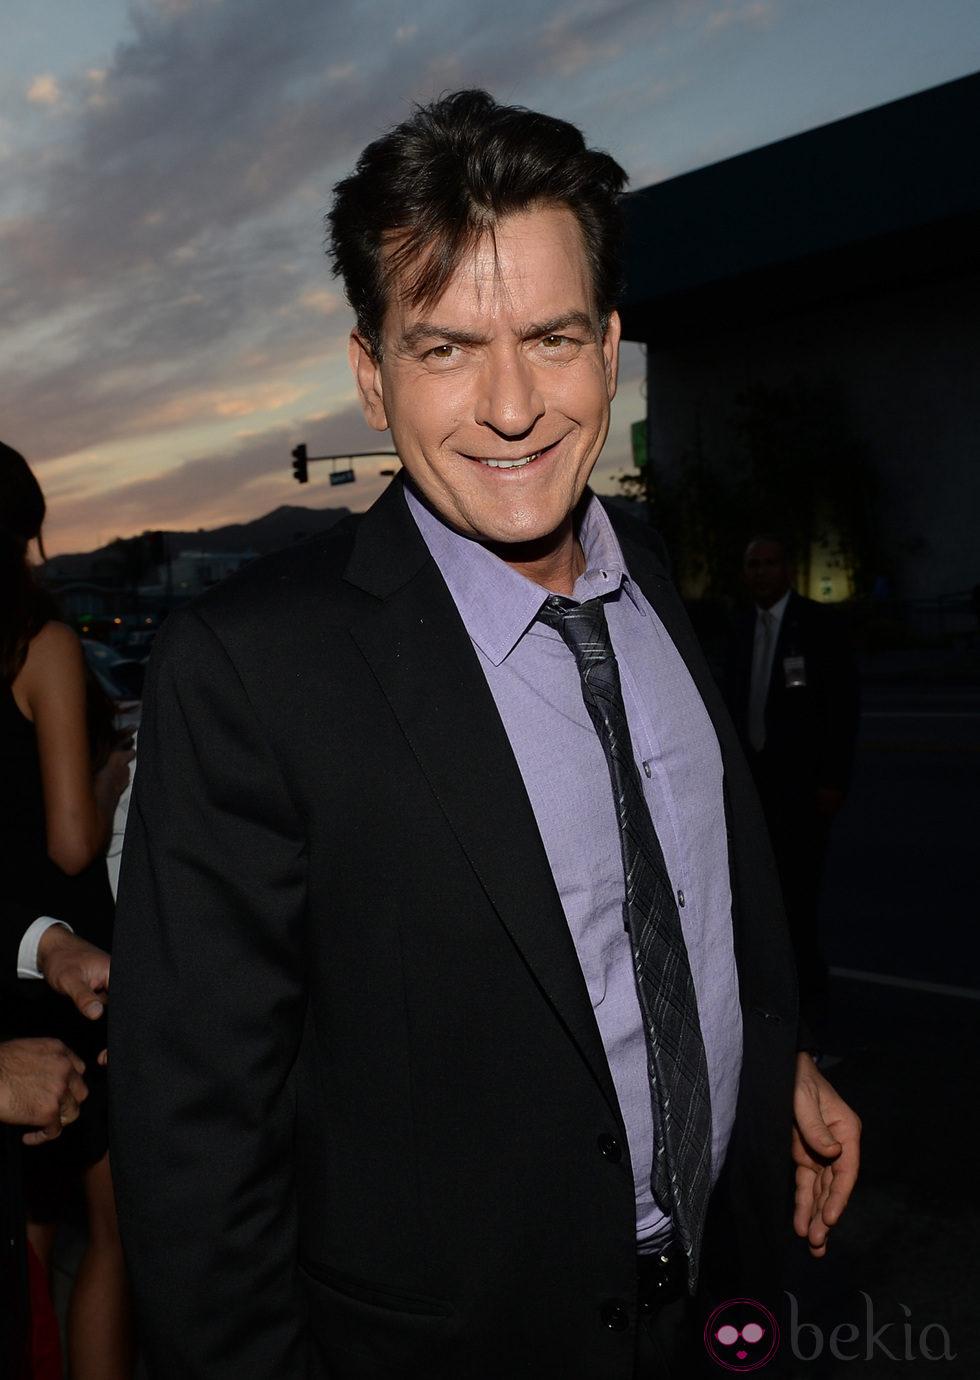 Charlie Sheen en la premiere de 'Scary Movie 5'